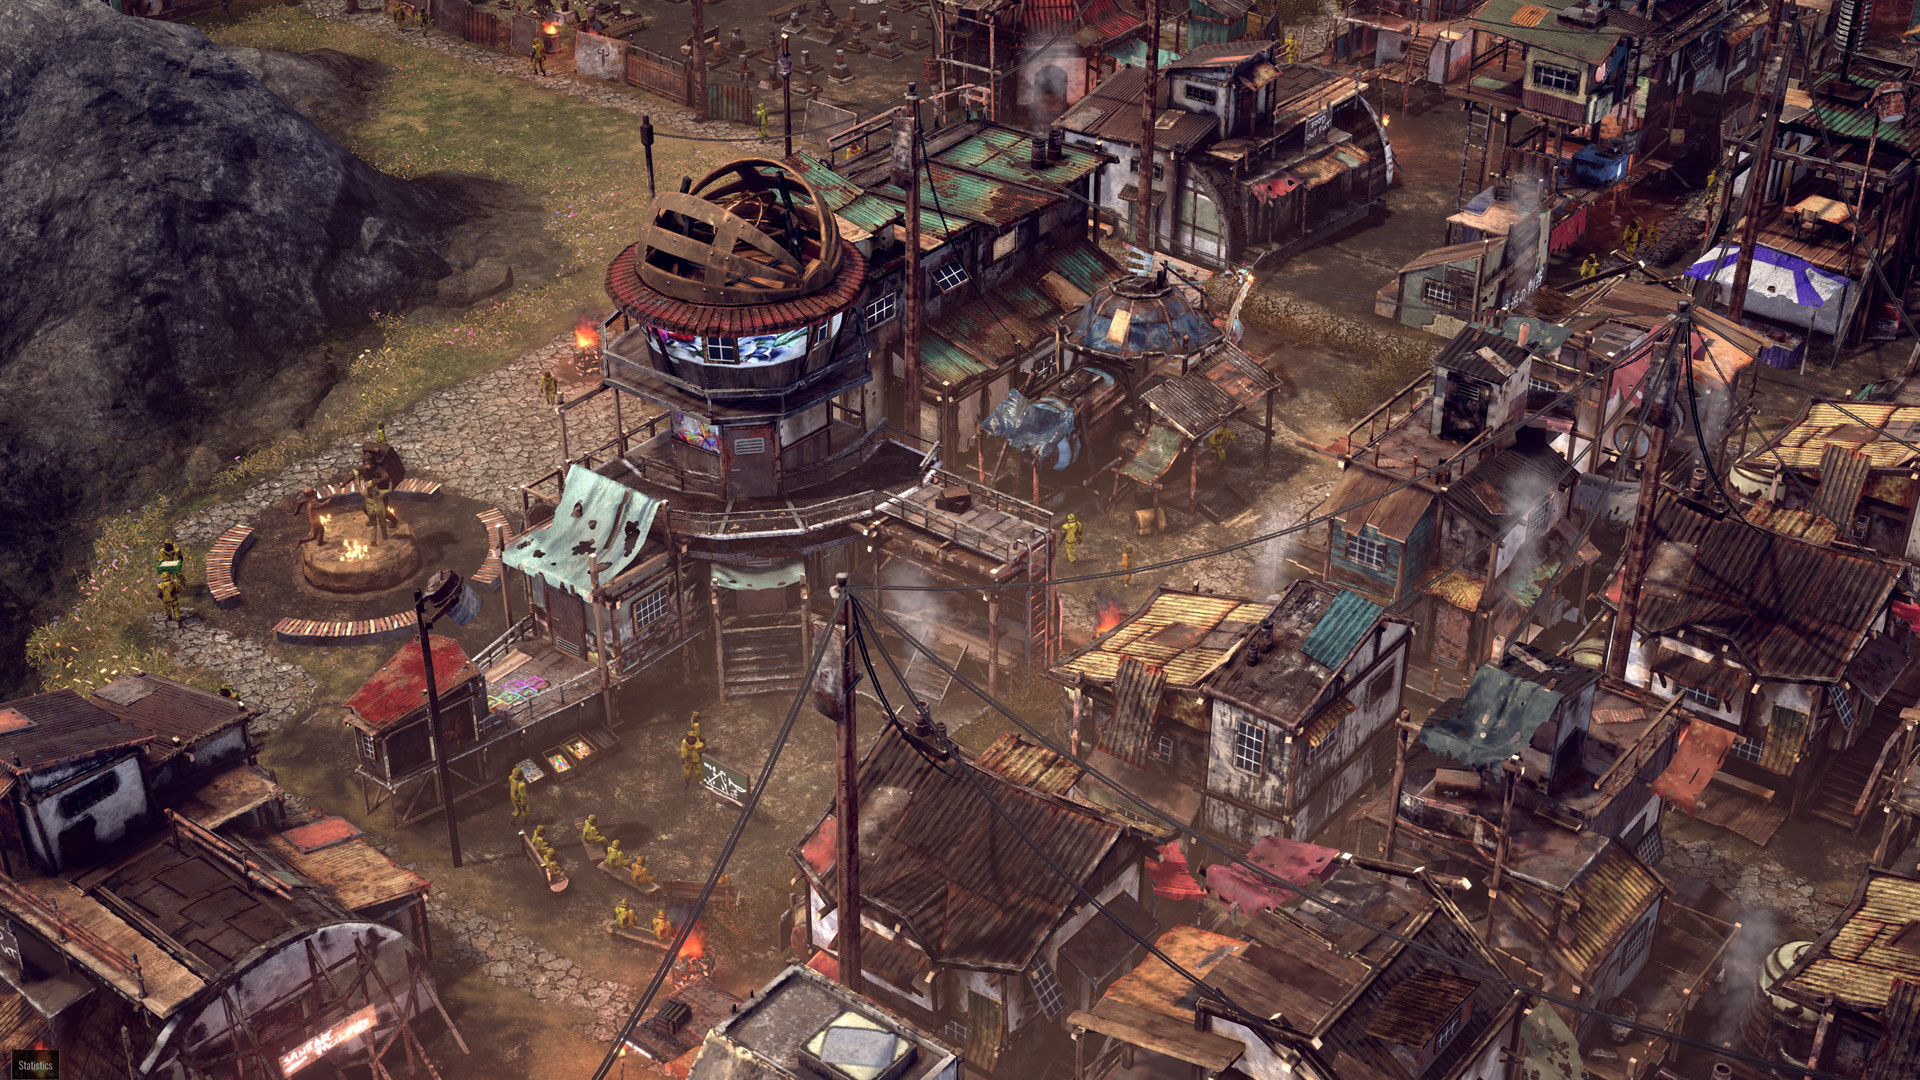 endzone-a-world-apart-pc-screenshot-2